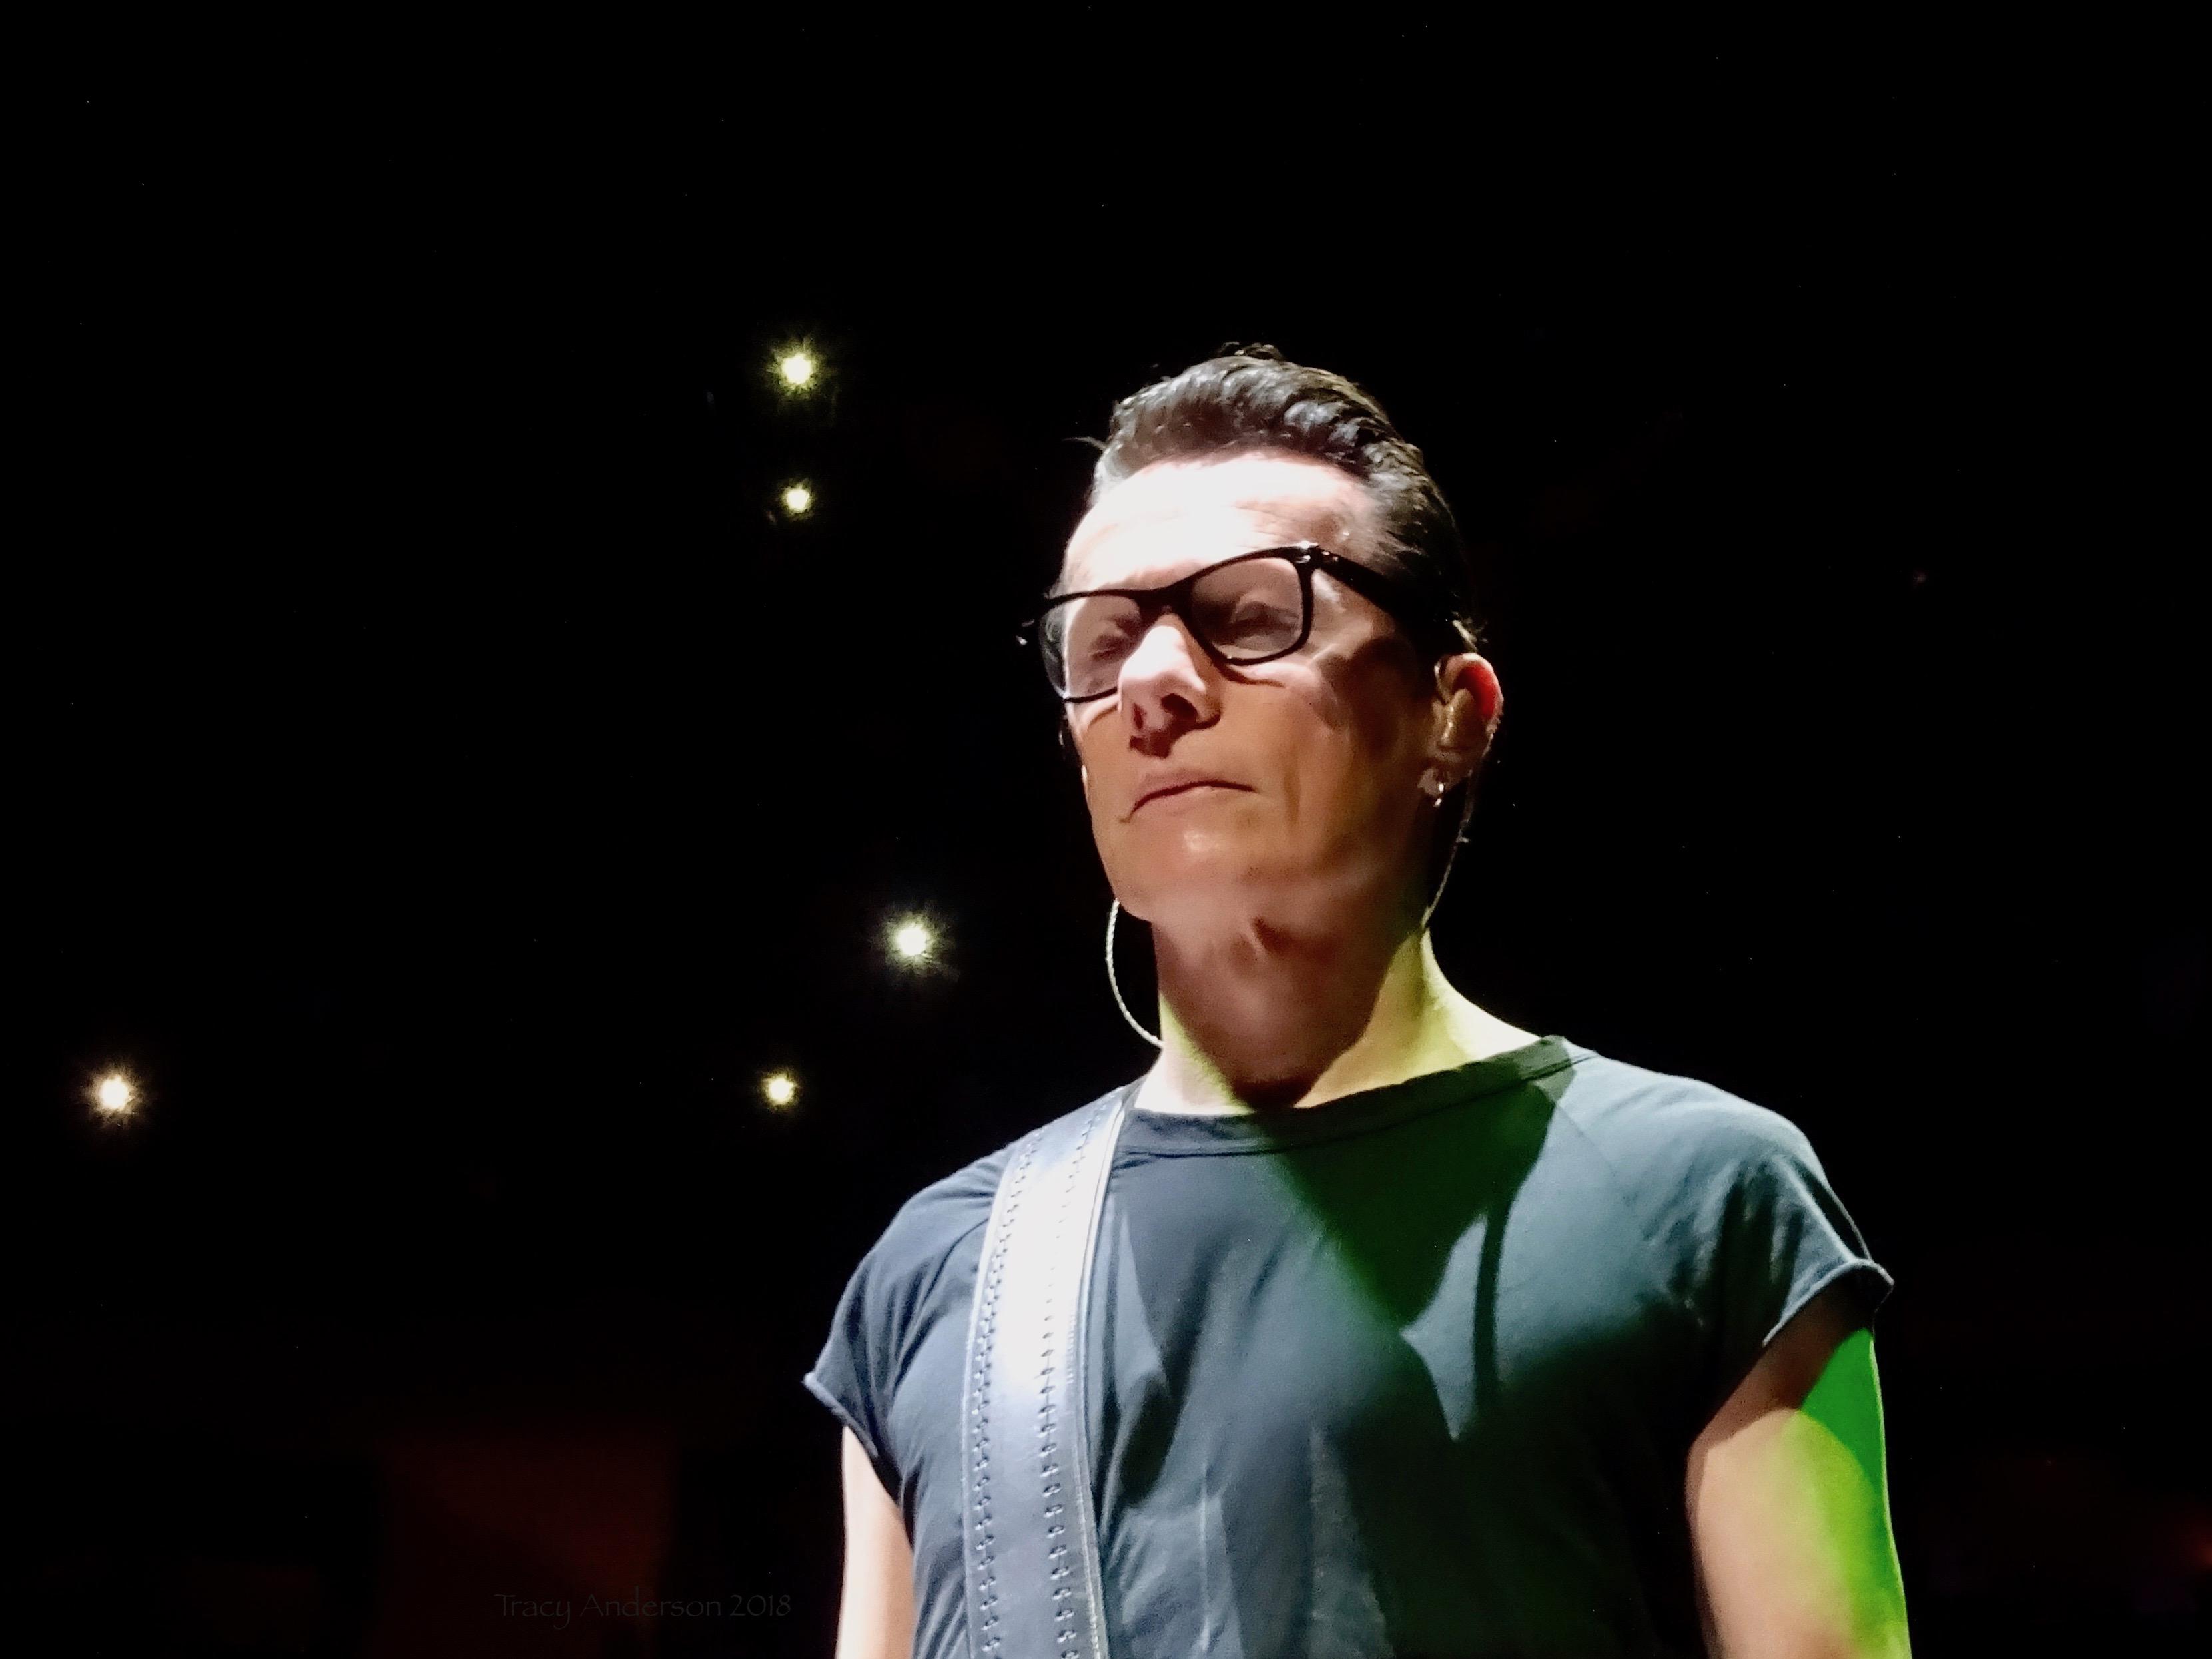 Larry Mullen Jr Stars U2 eXPERIENCE & iNNOCENCE Tour MSG